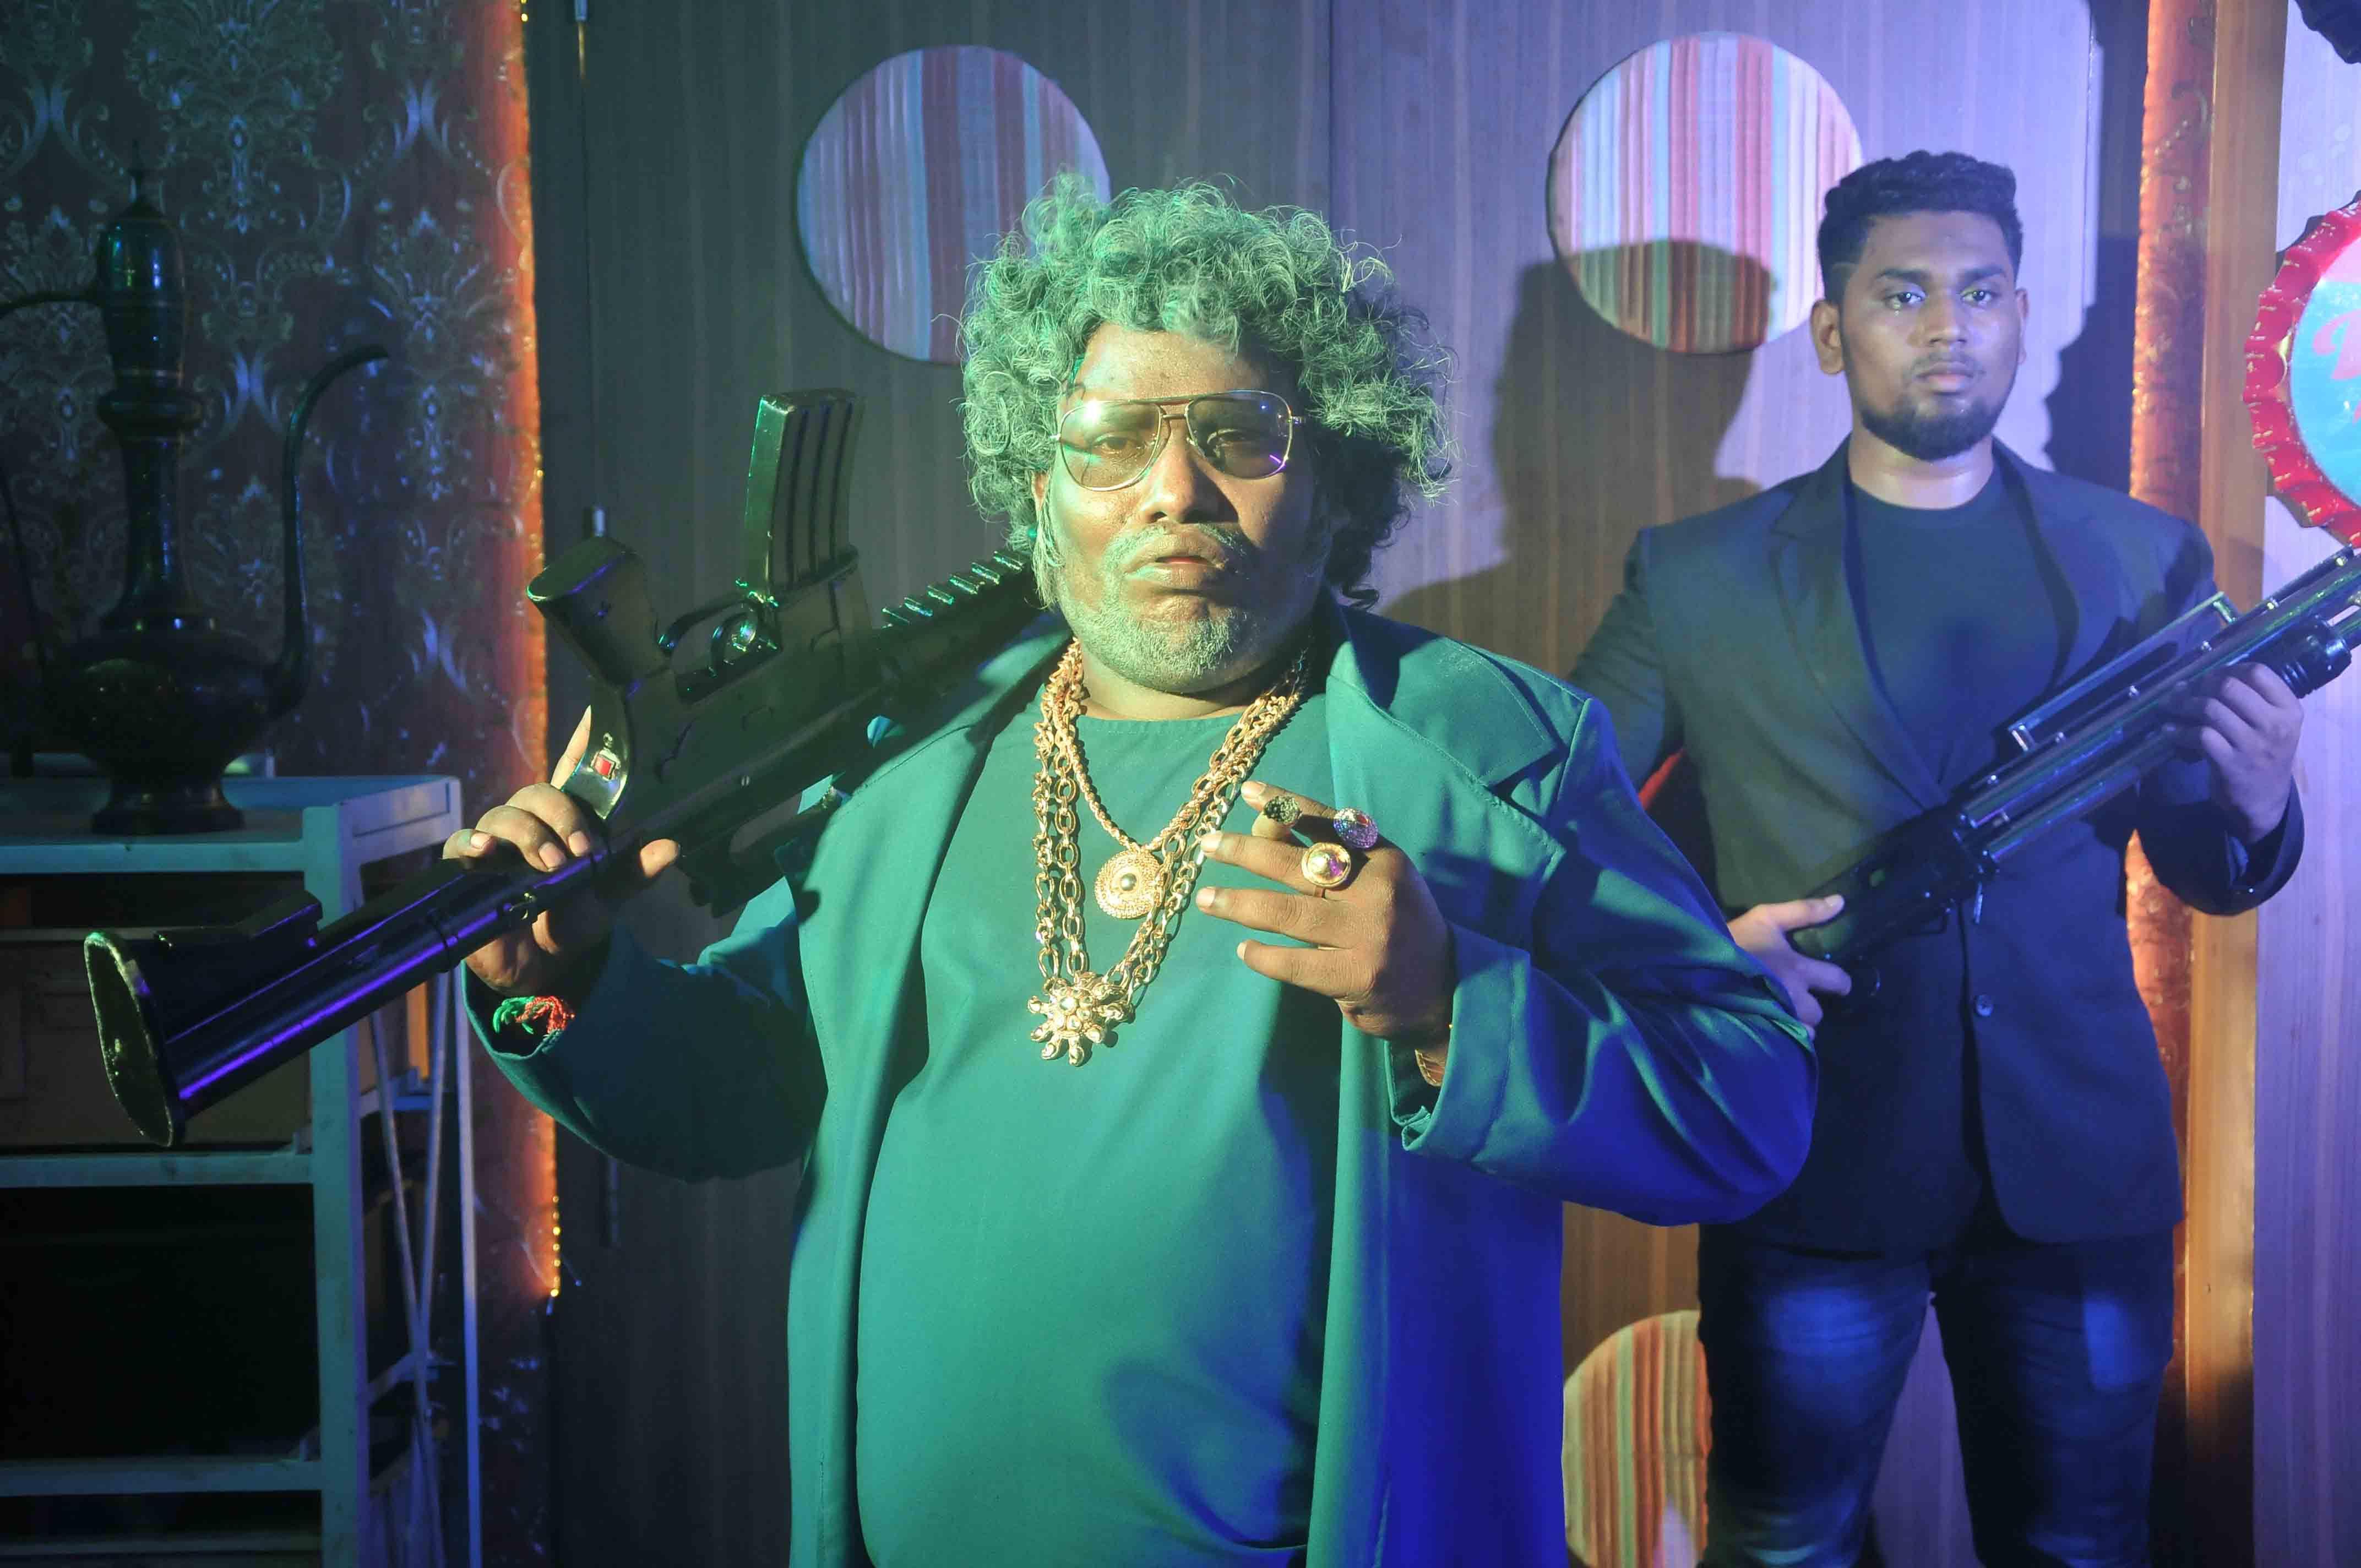 Actor Yogi Babu's dual role as father and son in Siddarth's 'Takkar'